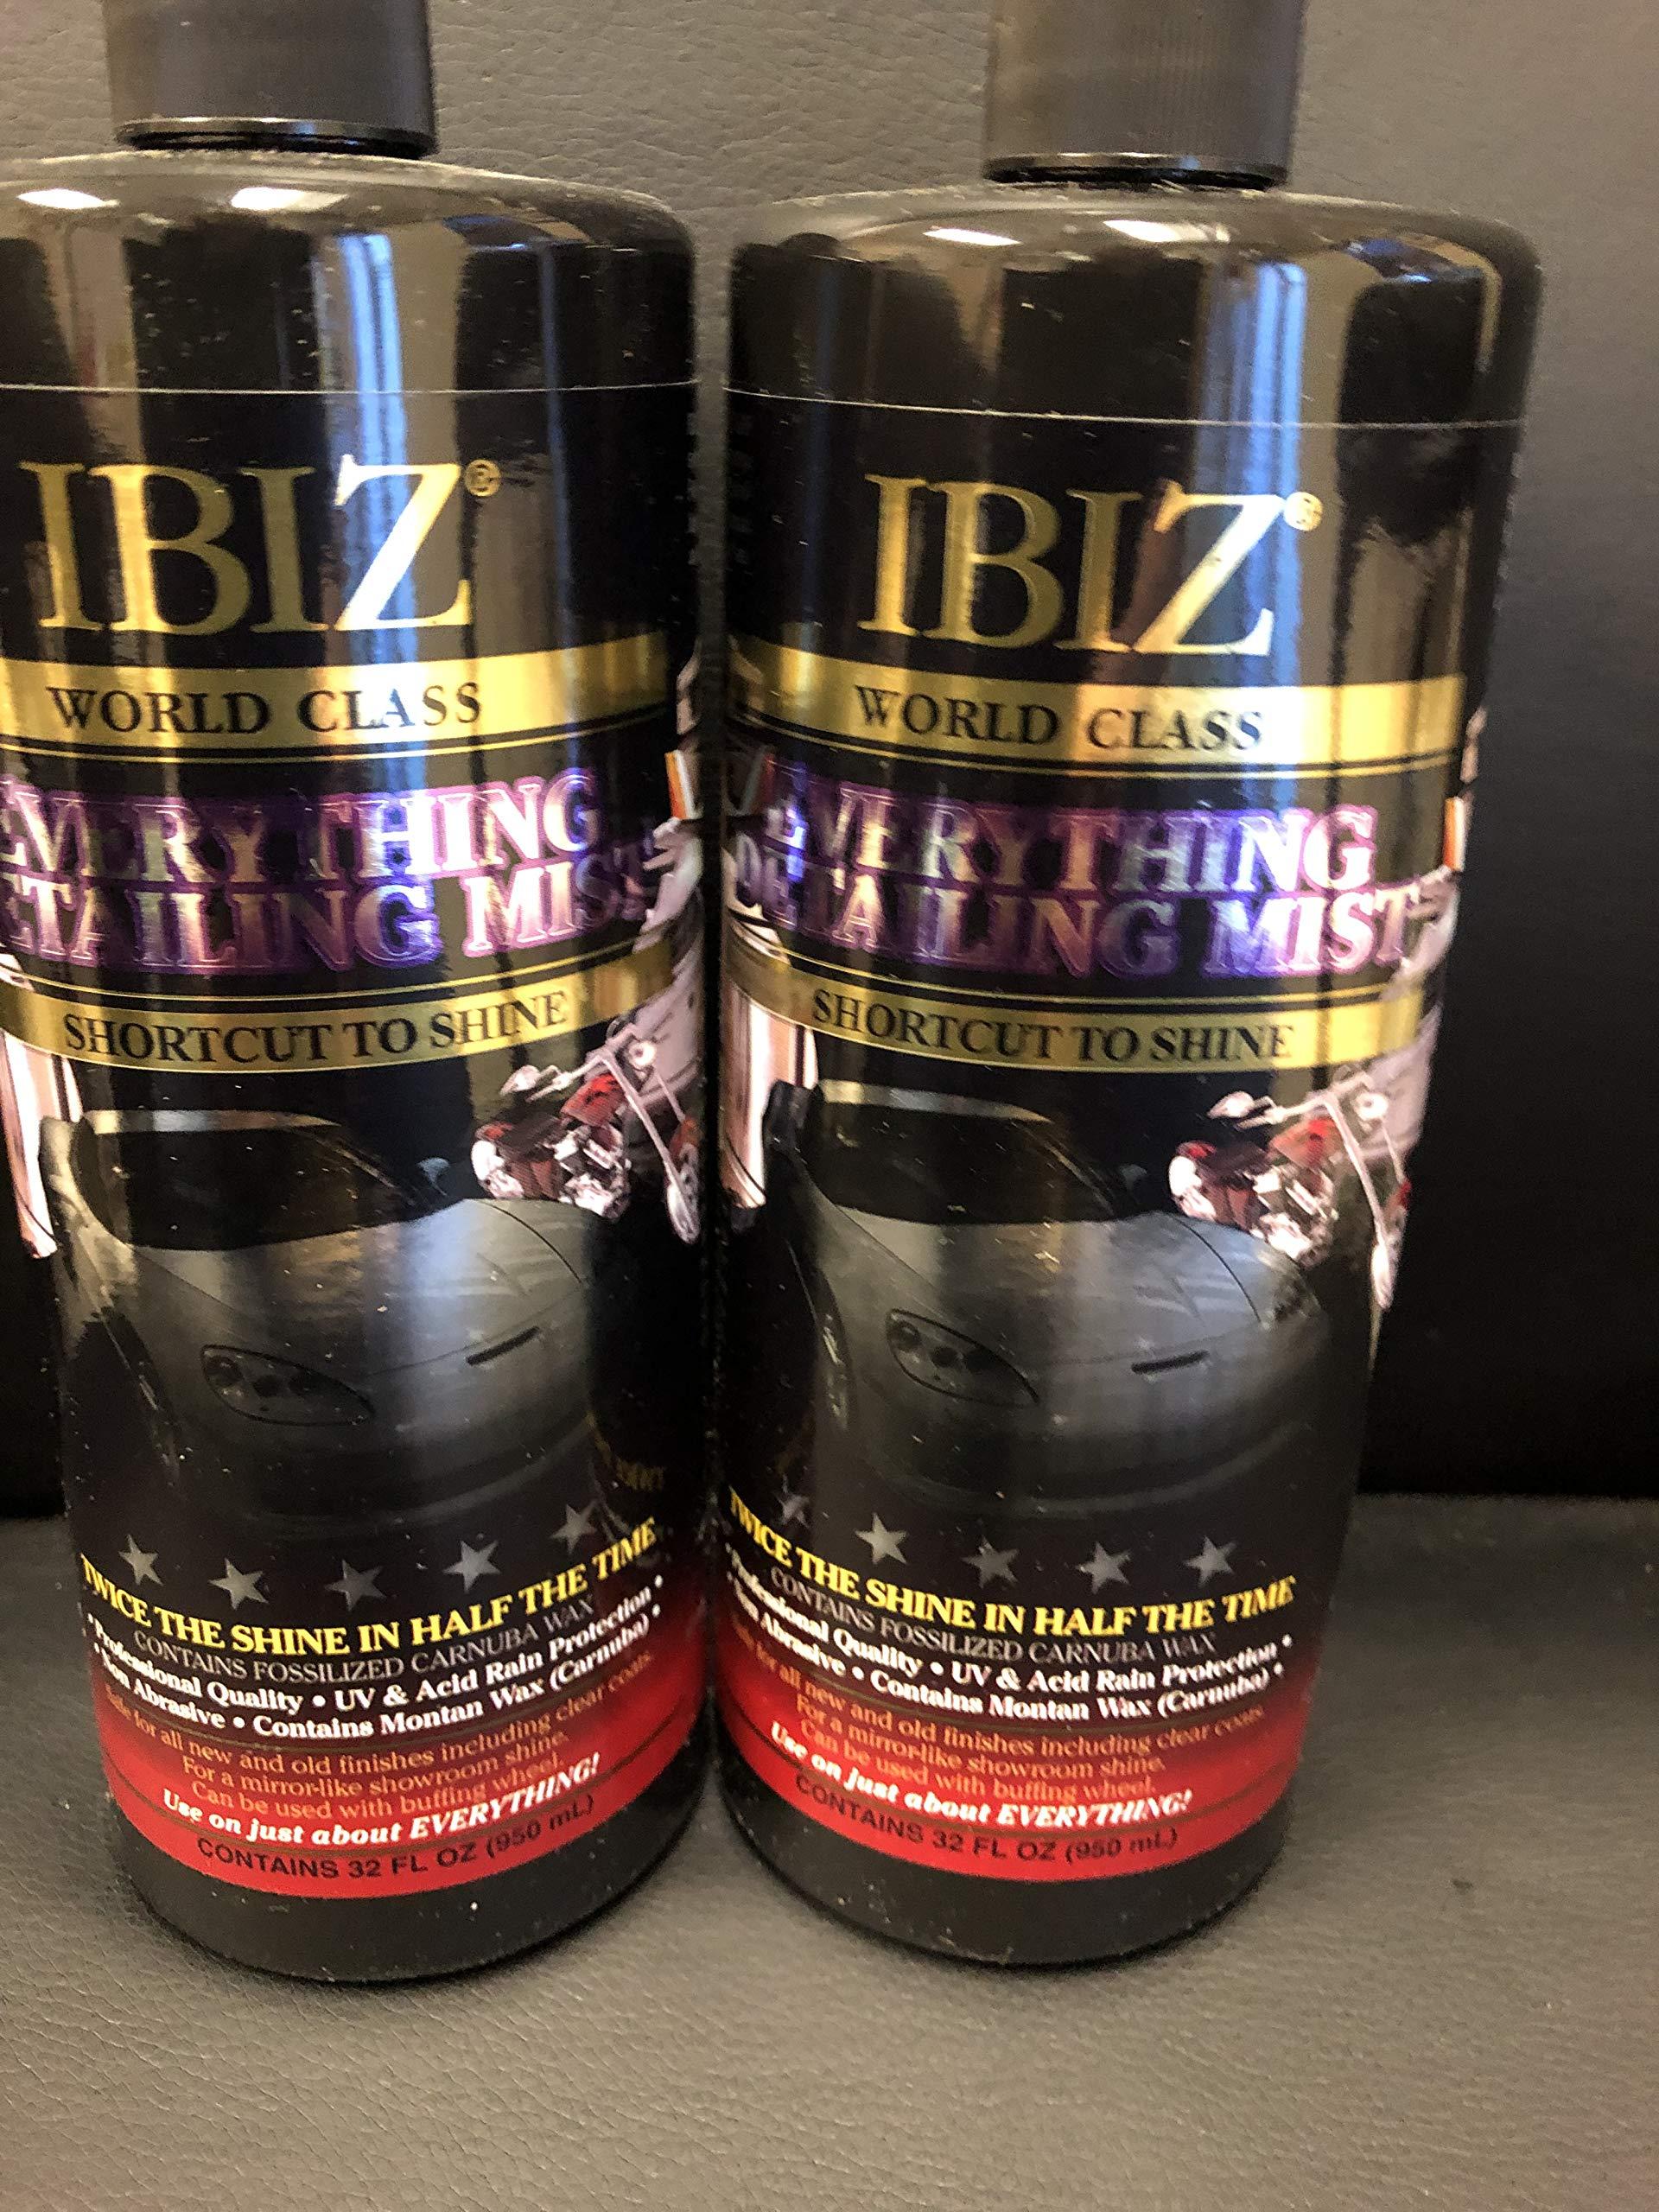 IBIZ Everything Detailing Mist (2) Bottles